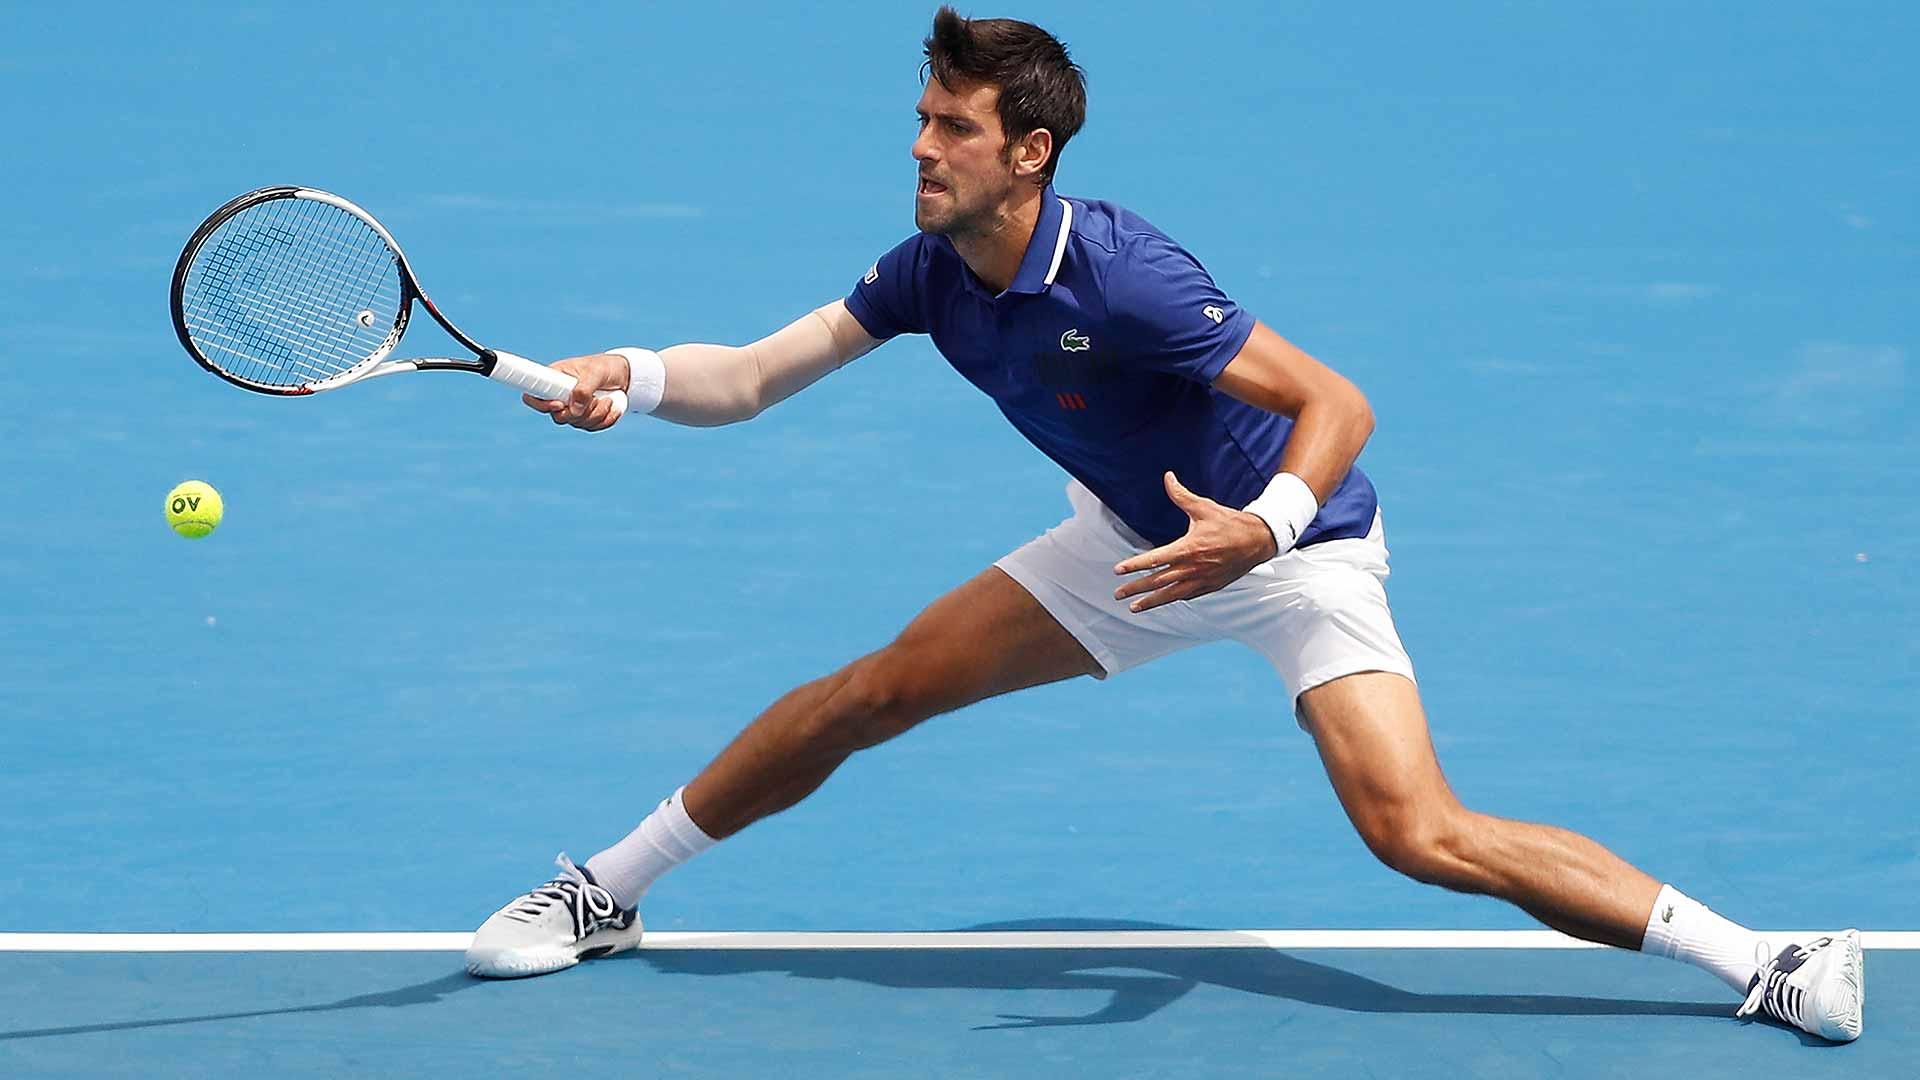 Novak Djokovic devolviendo un golpe